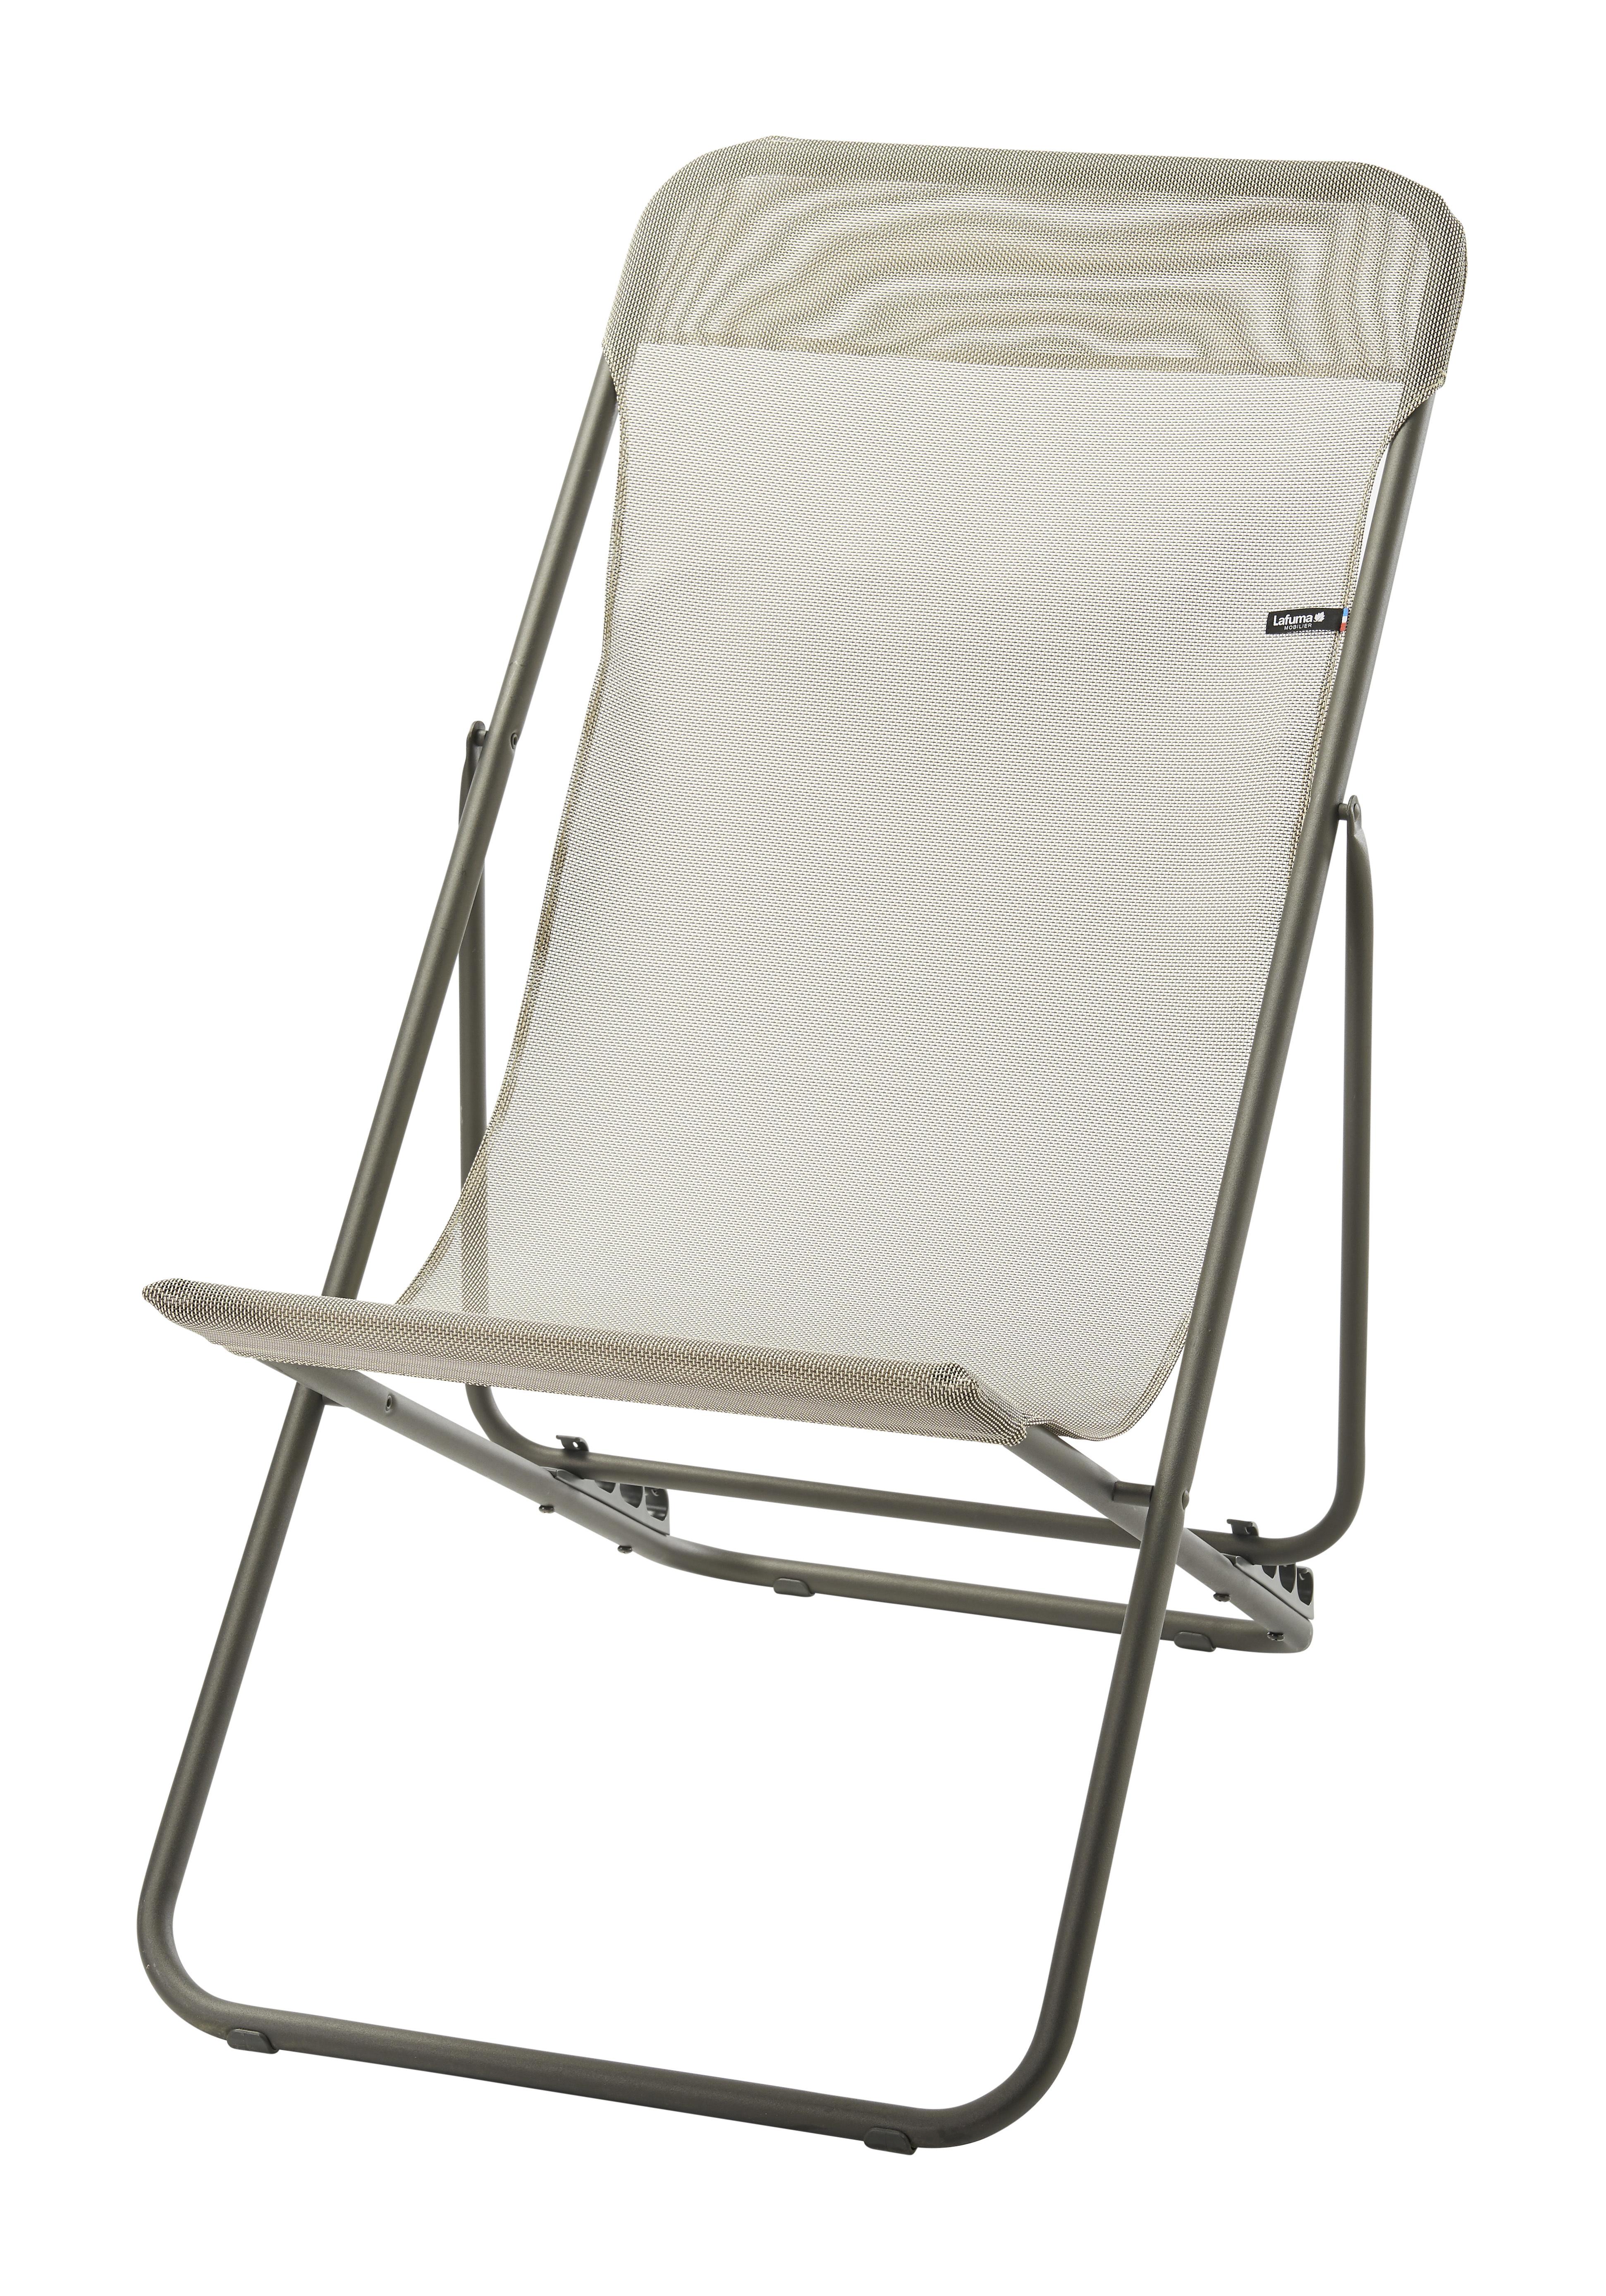 Pas Lafuma Texplast Longue Chaise 2 Seigle Transatube Beige v80ONnmw